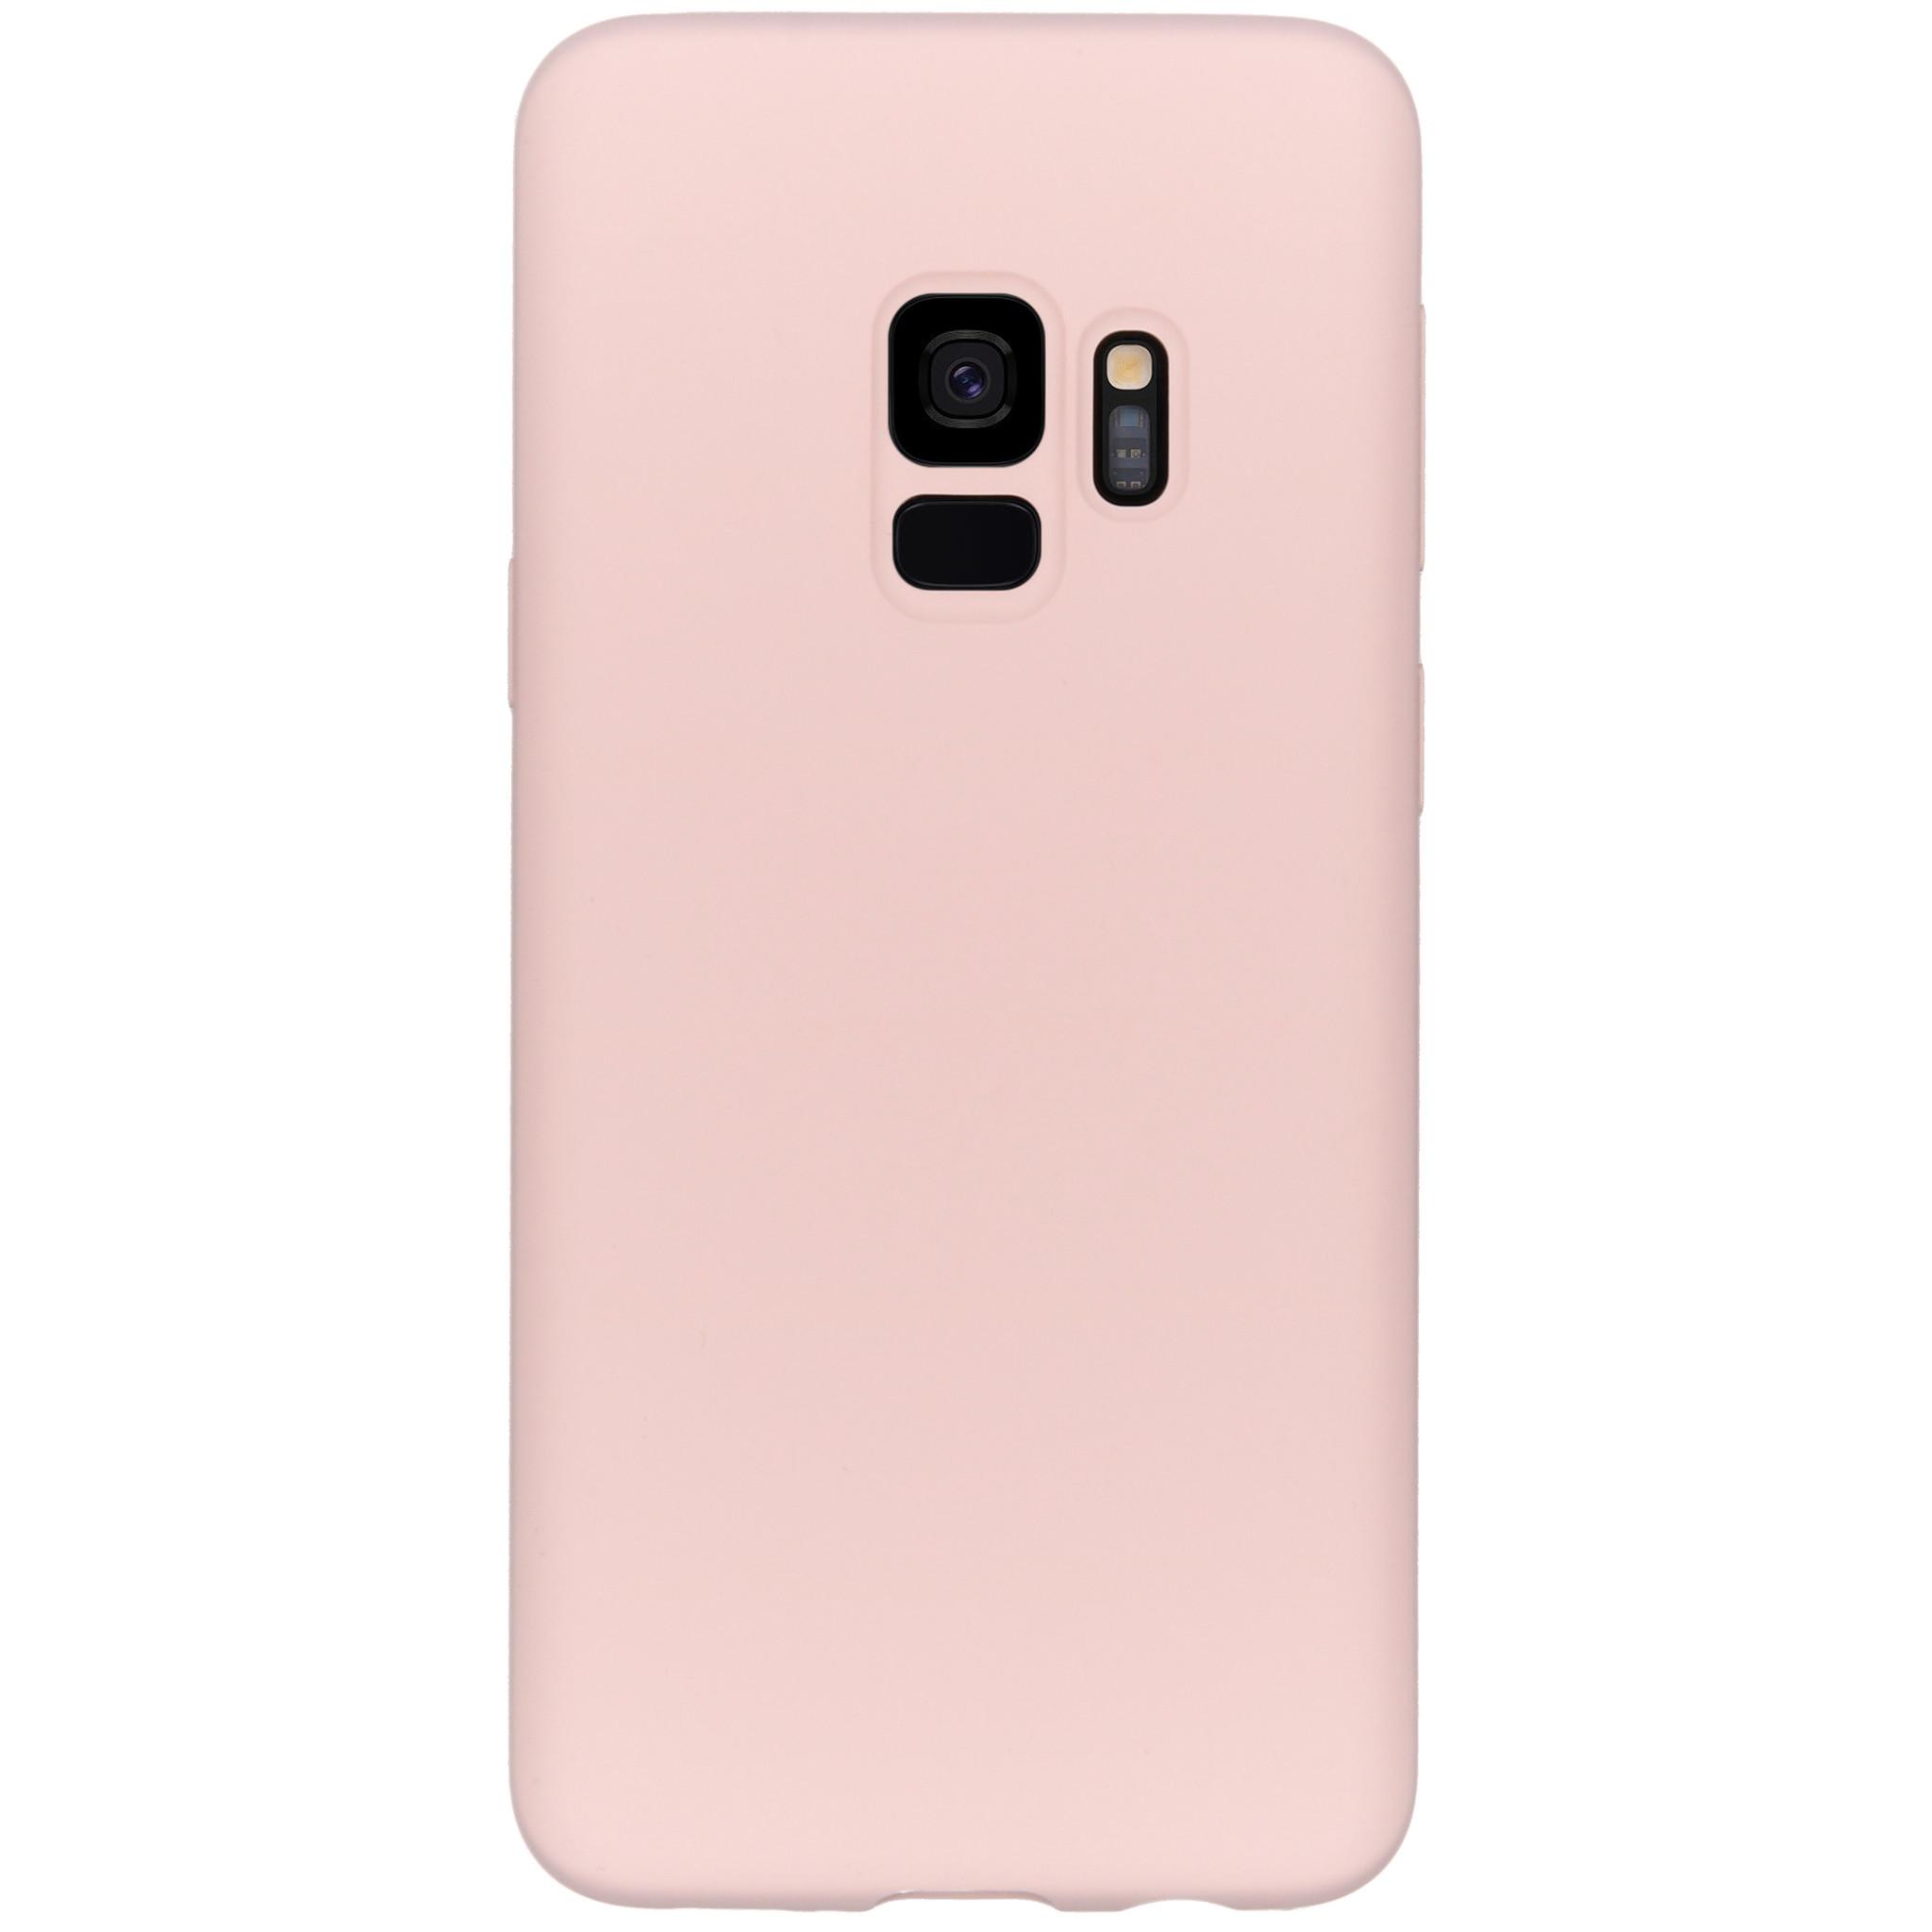 Accezz Liquid Silikoncase Rosa für das Samsung Galaxy S9